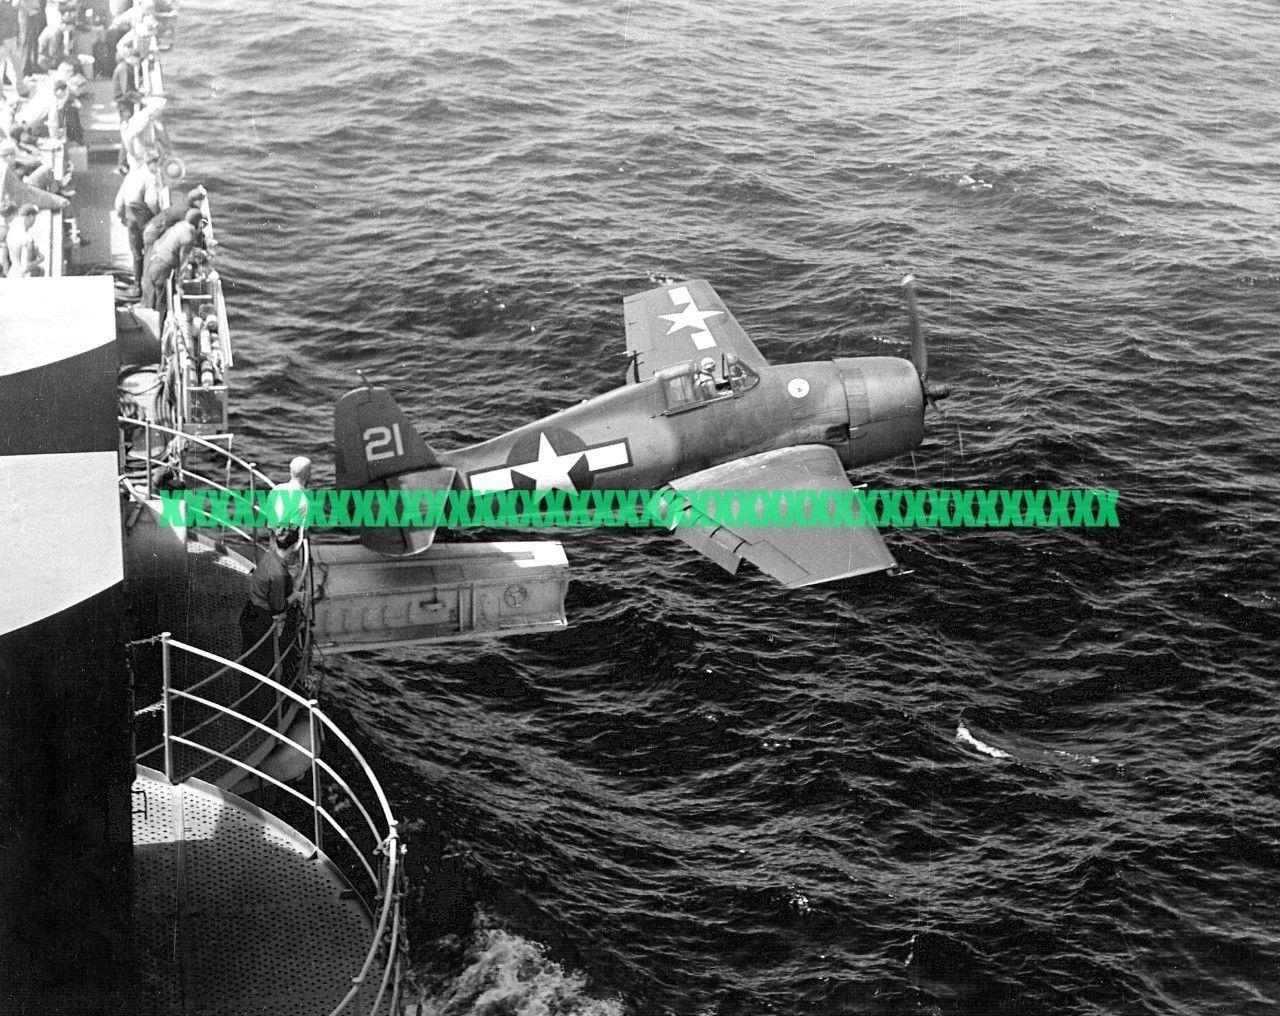 Grumman F6F Hellcat_15_USS-Hornet-CV-12-Hanger Cat.jpg